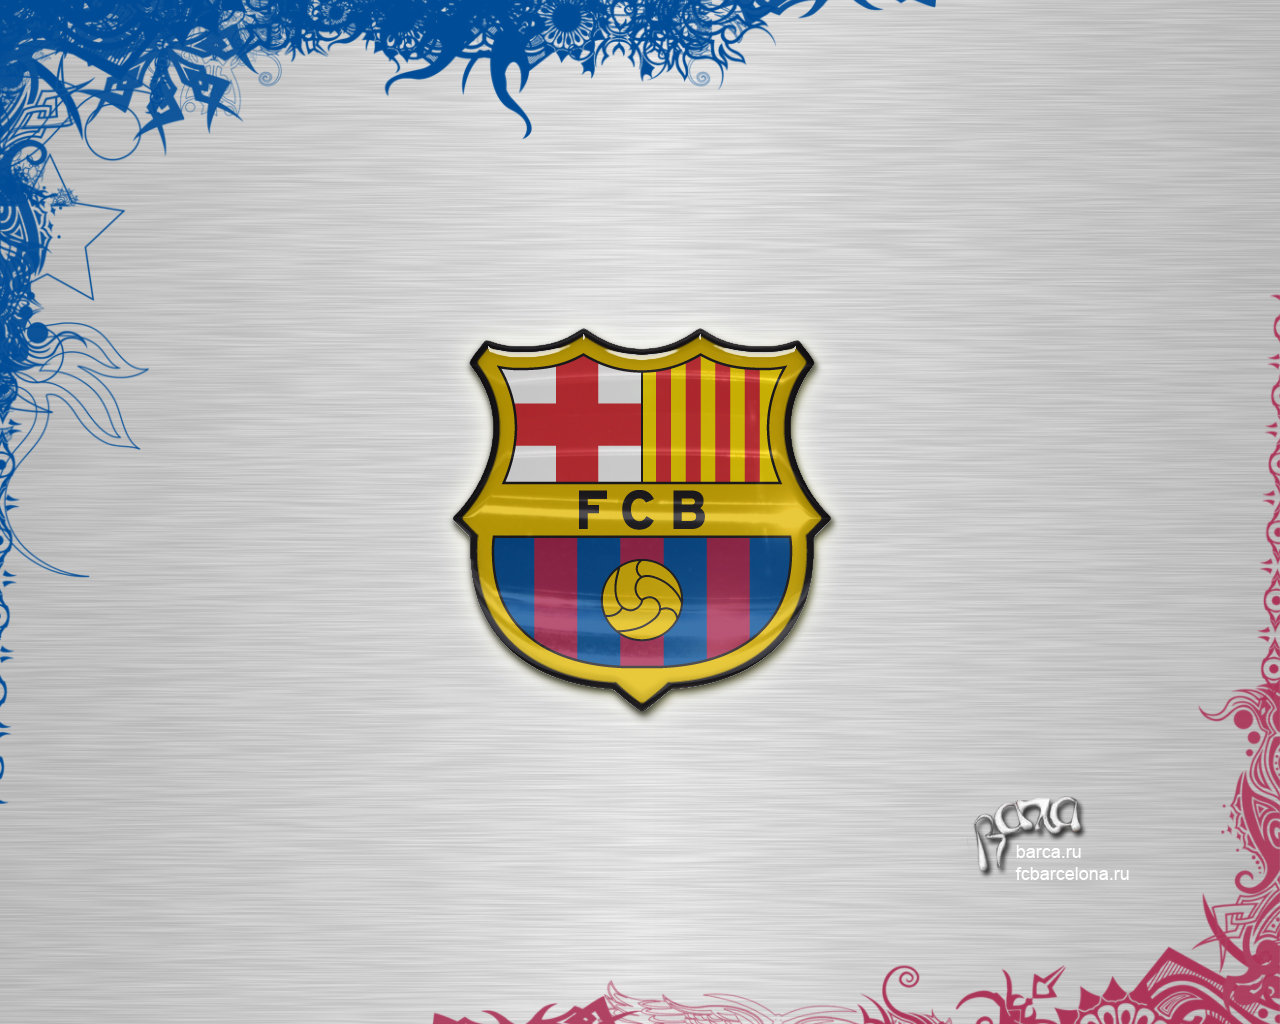 http://2.bp.blogspot.com/-2jhcefBkAsg/UOhn1rlthLI/AAAAAAAADNA/fMTrmGtDsG4/s1600/FC-Barcelona-Logo-HD-Wallpapers%2B01.jpg